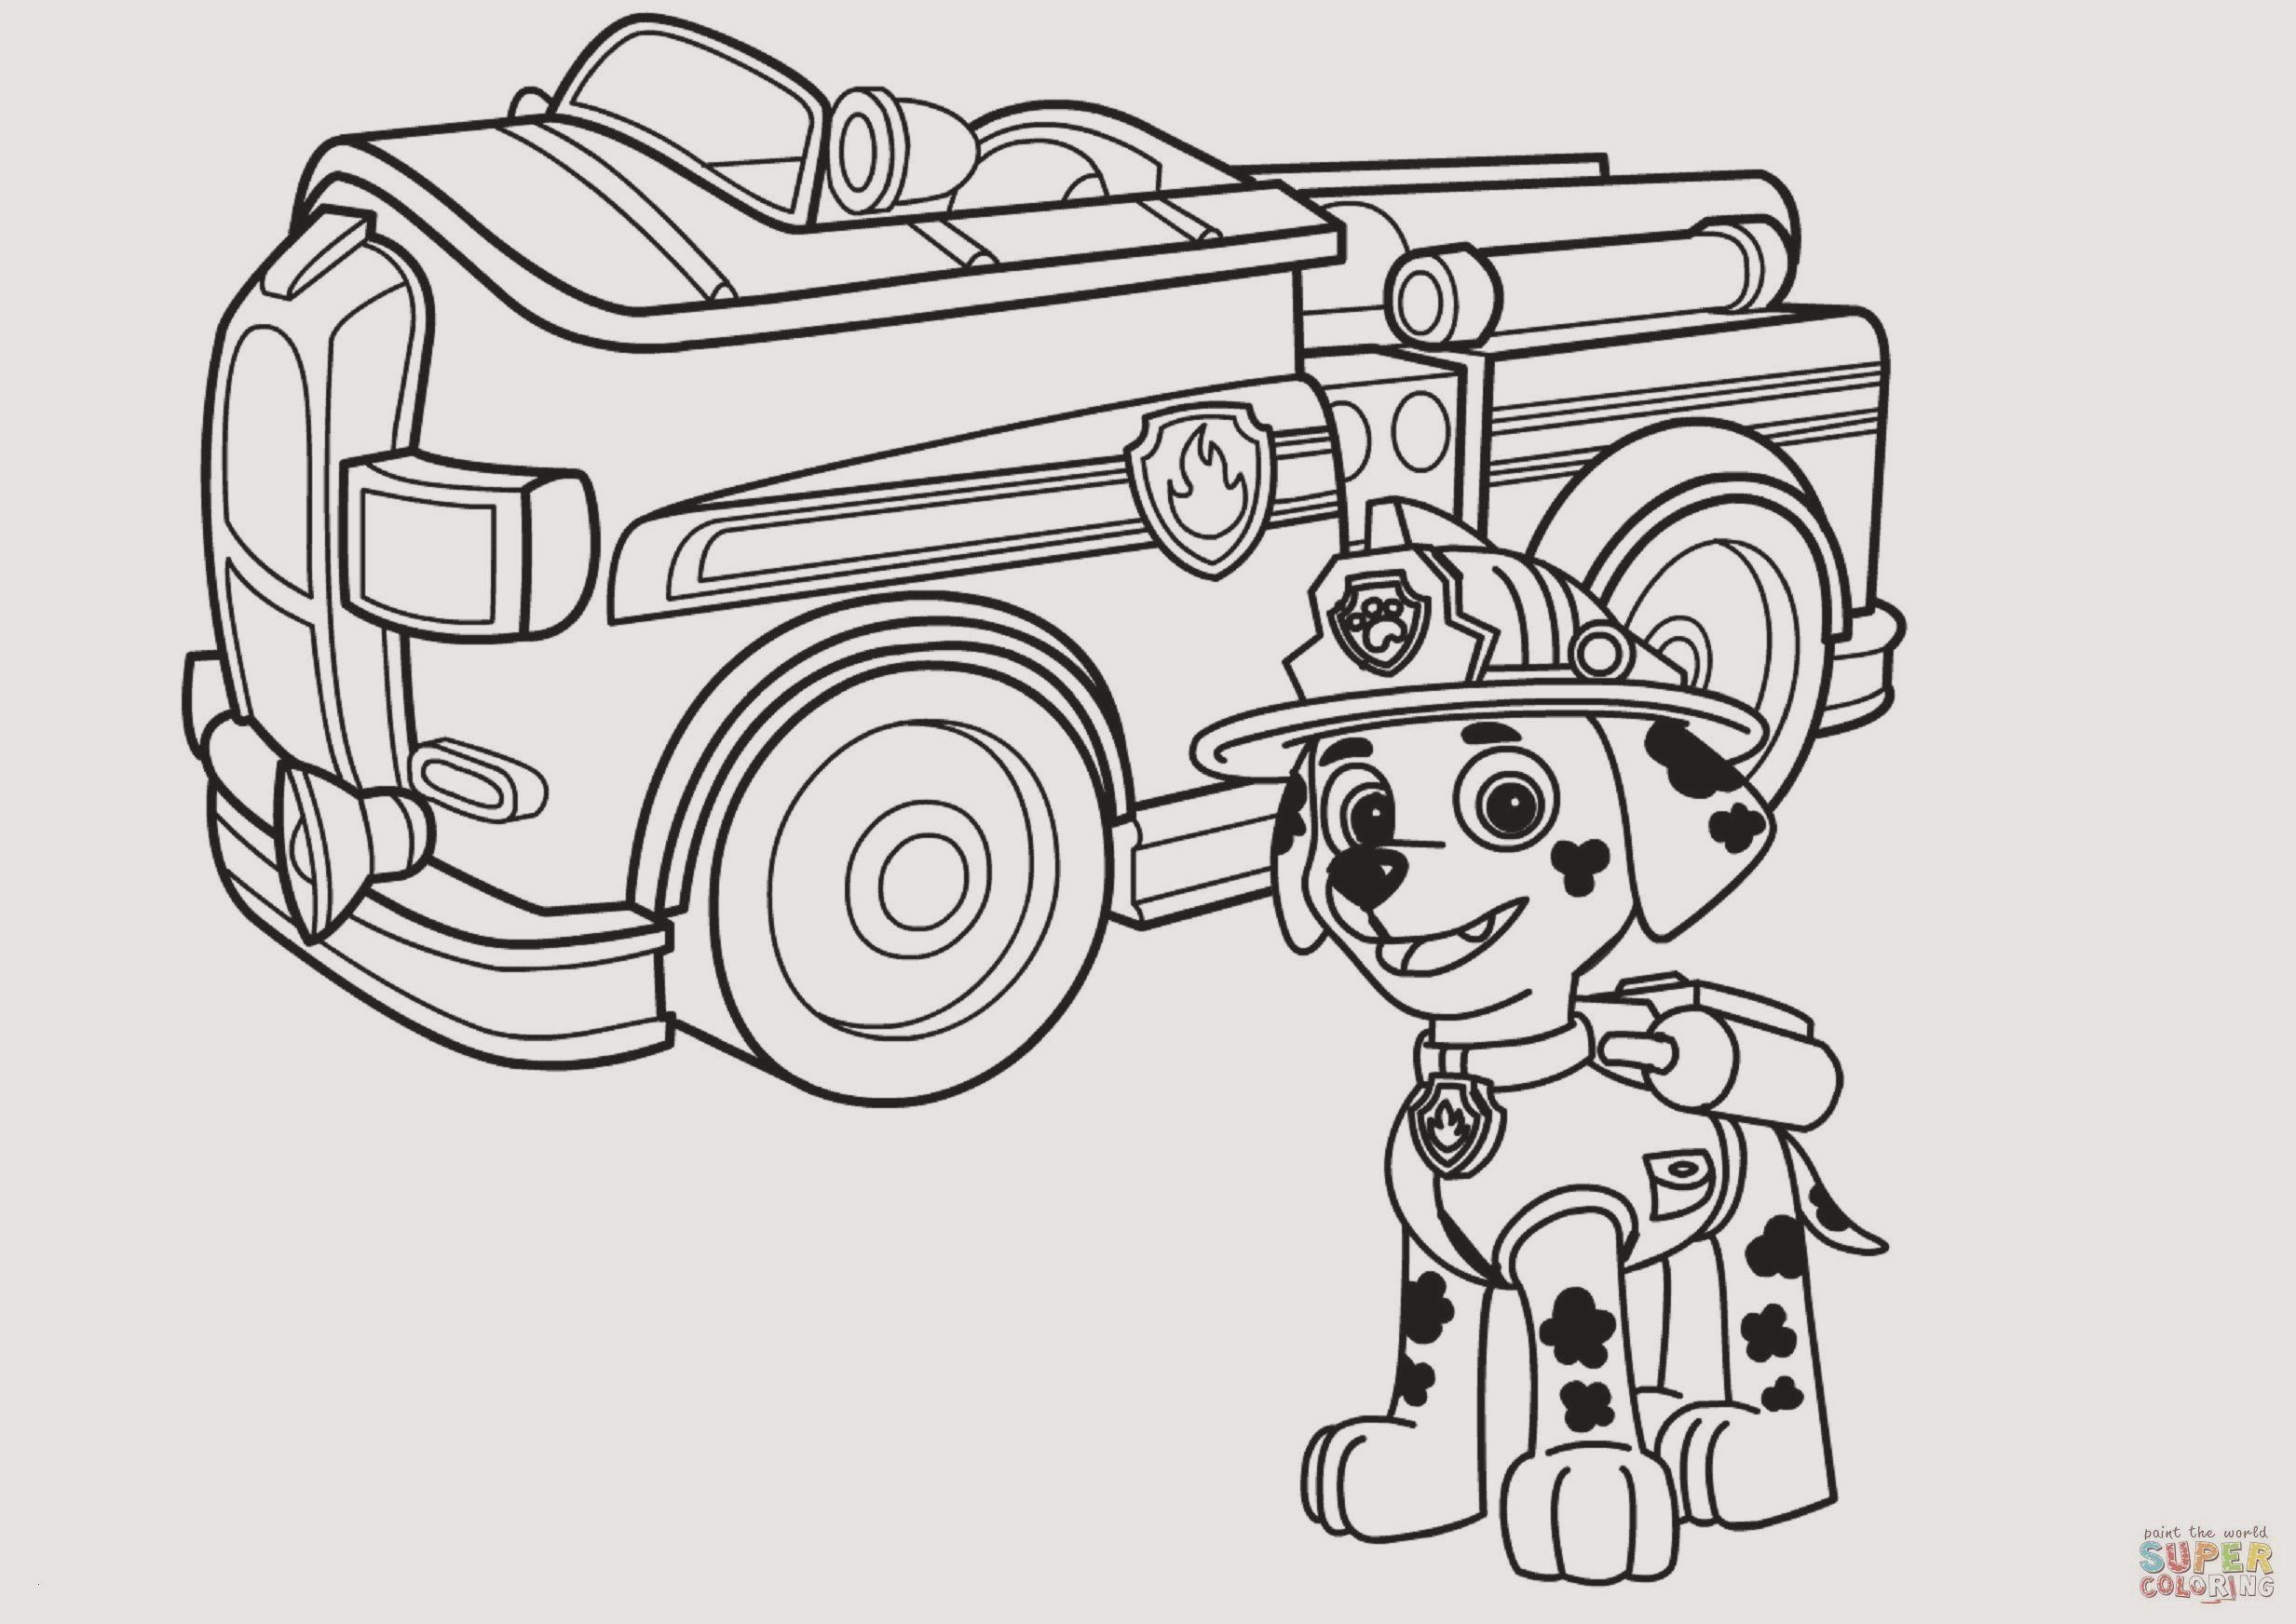 Hot Wheels Coloring Pages Best Of 31 Einzigartig Ausmalbilder Hot Wheels Ausdrucken In 2020 Paw Patrol Coloring Paw Patrol Coloring Pages Monster Truck Coloring Pages